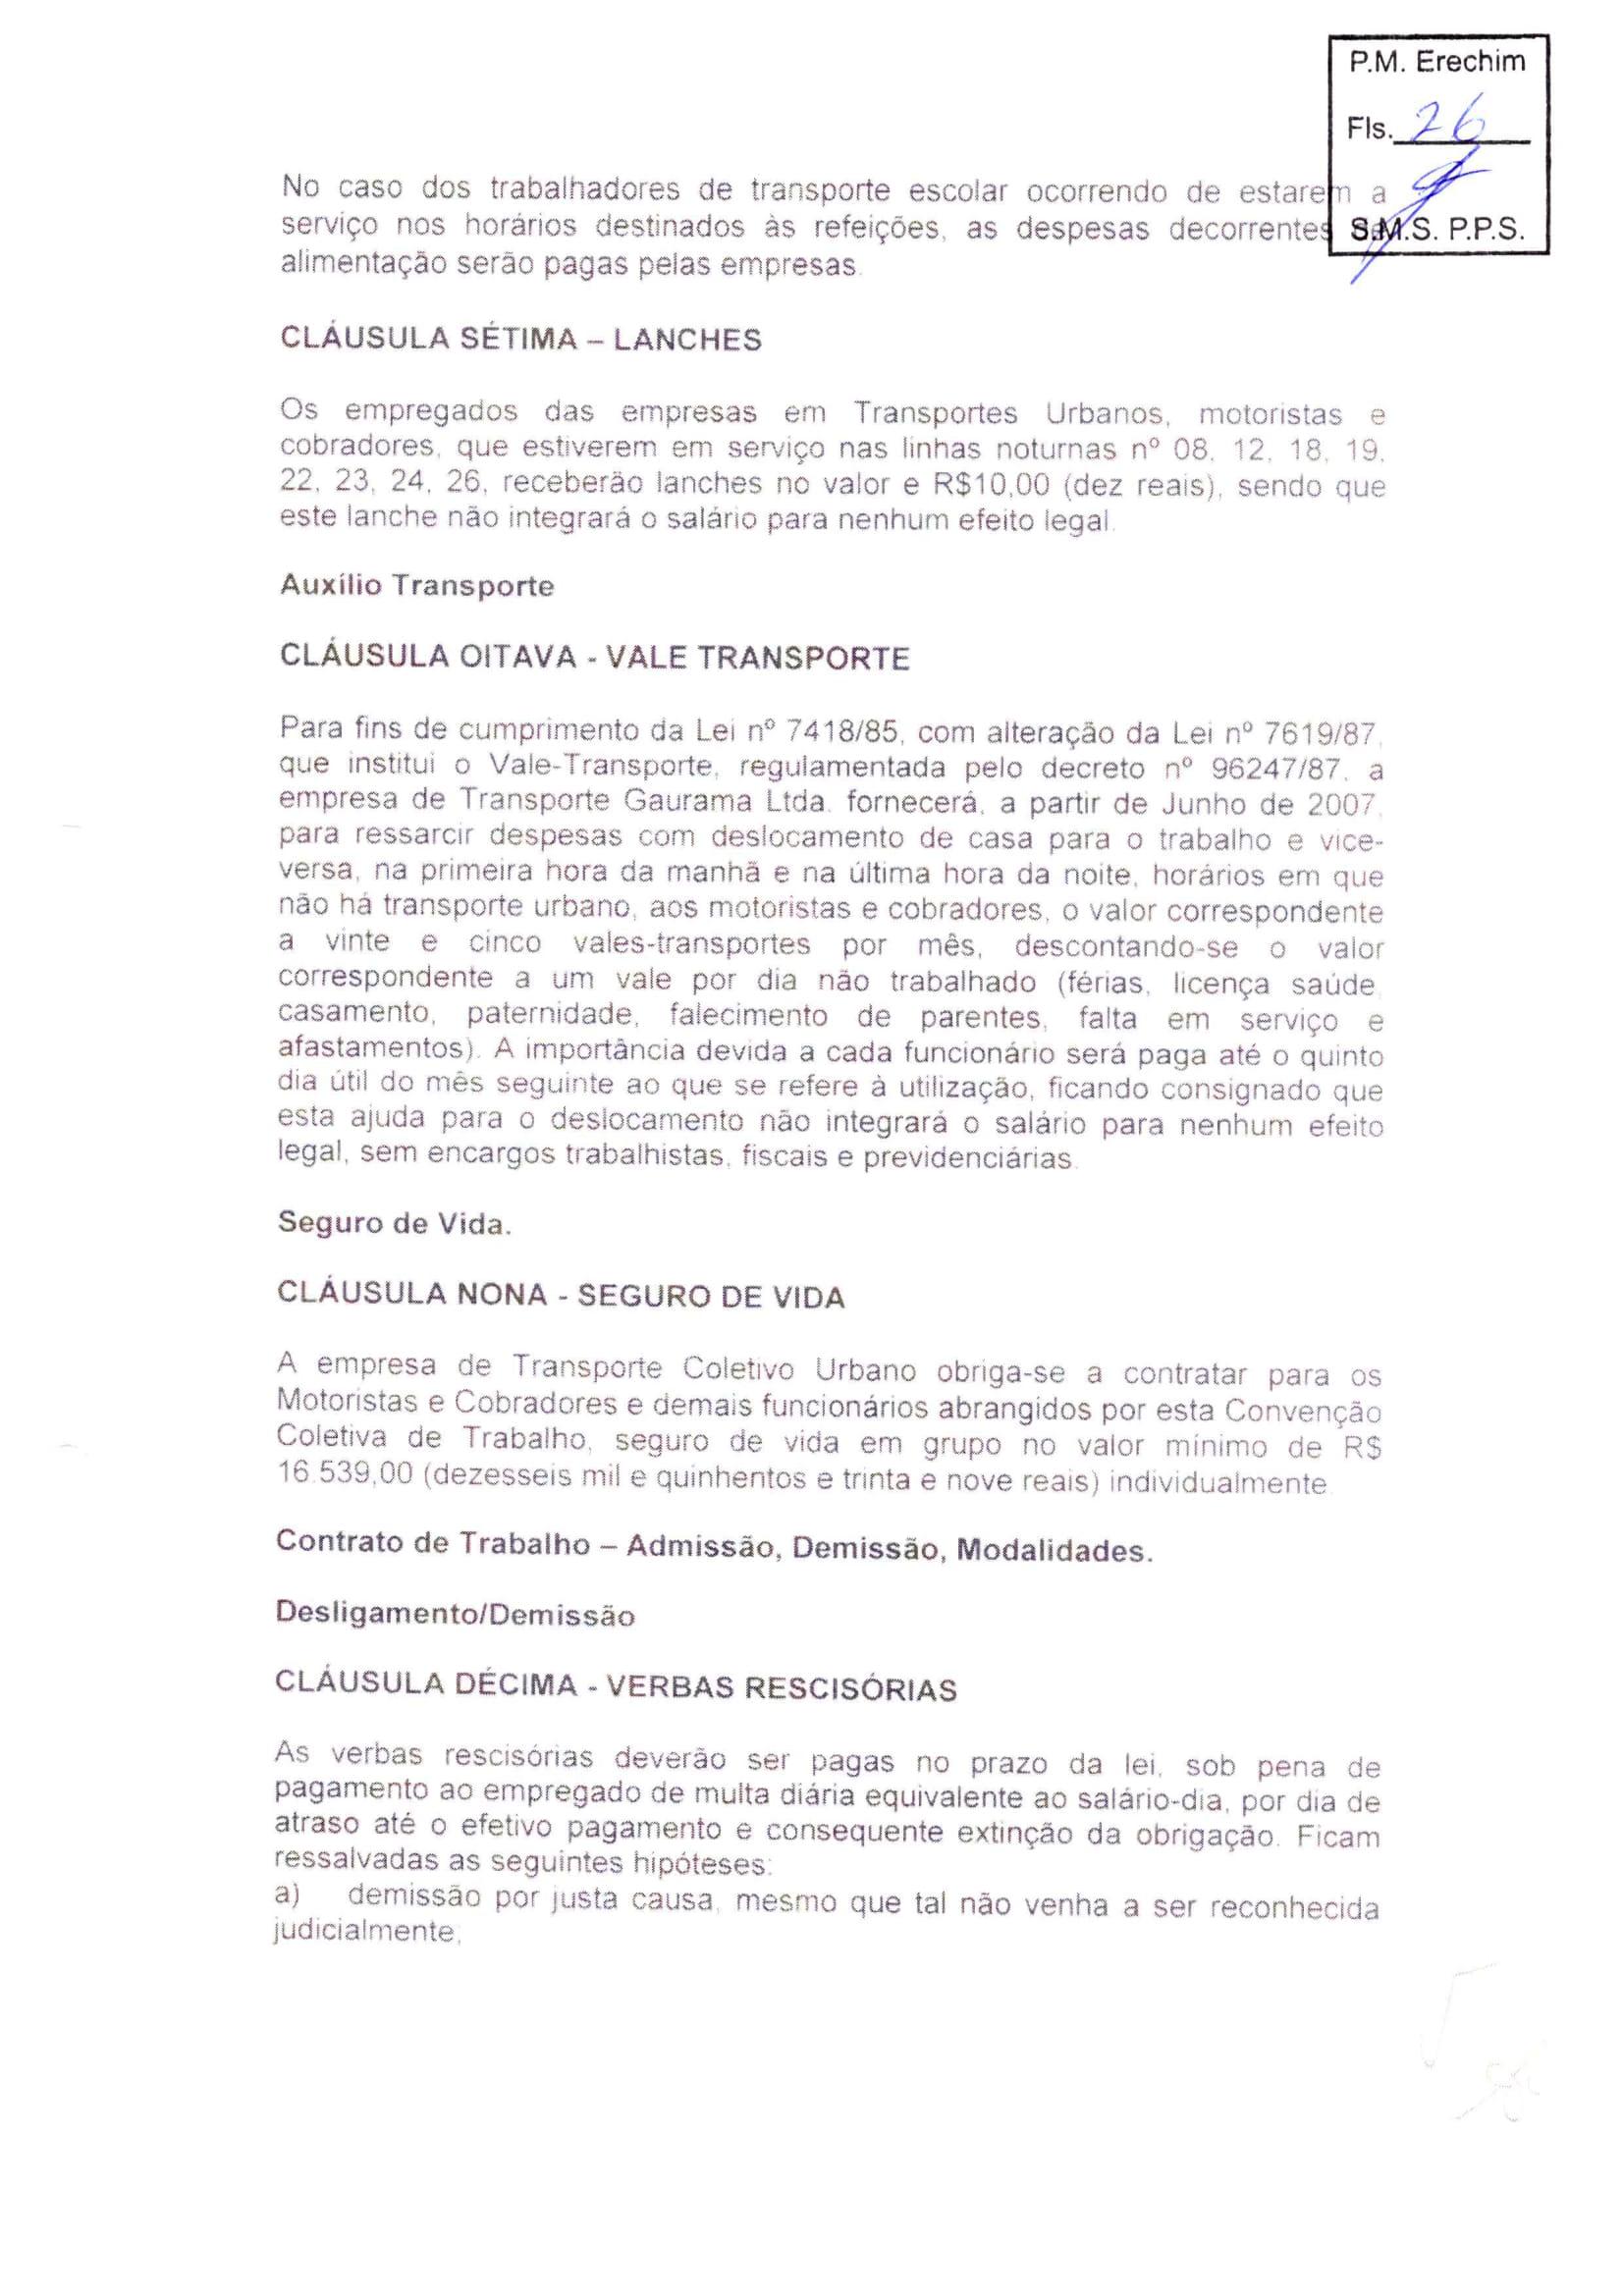 Tarifas - Atualizacao-07